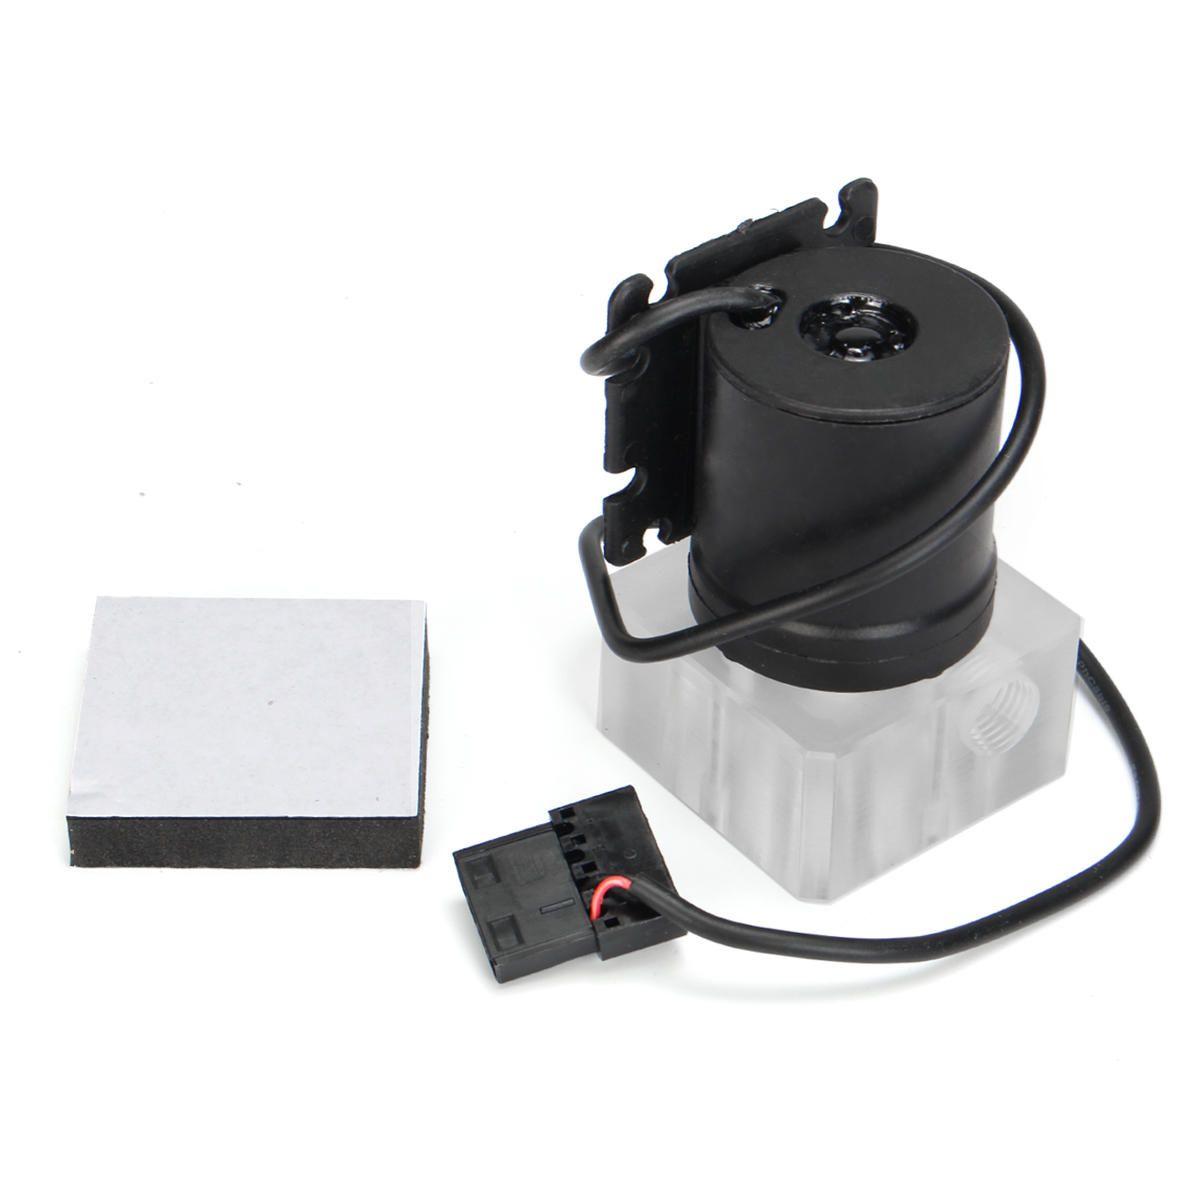 Pc Water Cooling Kit 240mm Radiator Pump Reservoir Cpu Block Rigid Tubes Diy Sale Banggood Com